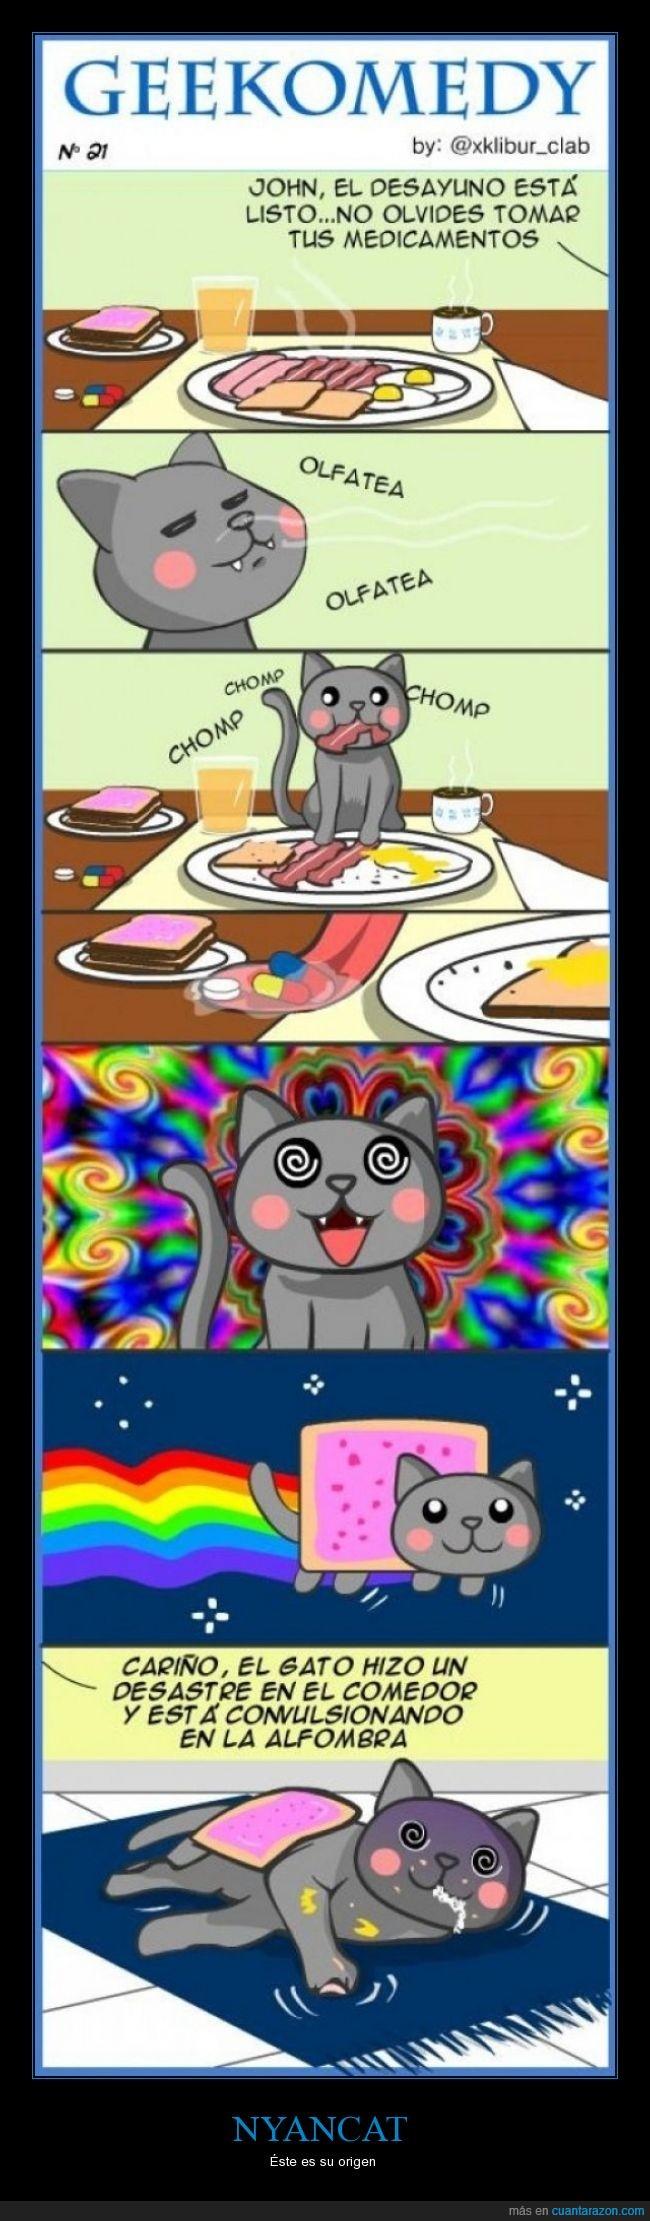 cielo,desayuno,droga,medicina,nyan cat,nyan-cat,nyancat,origen,pastilla,poptart,universo